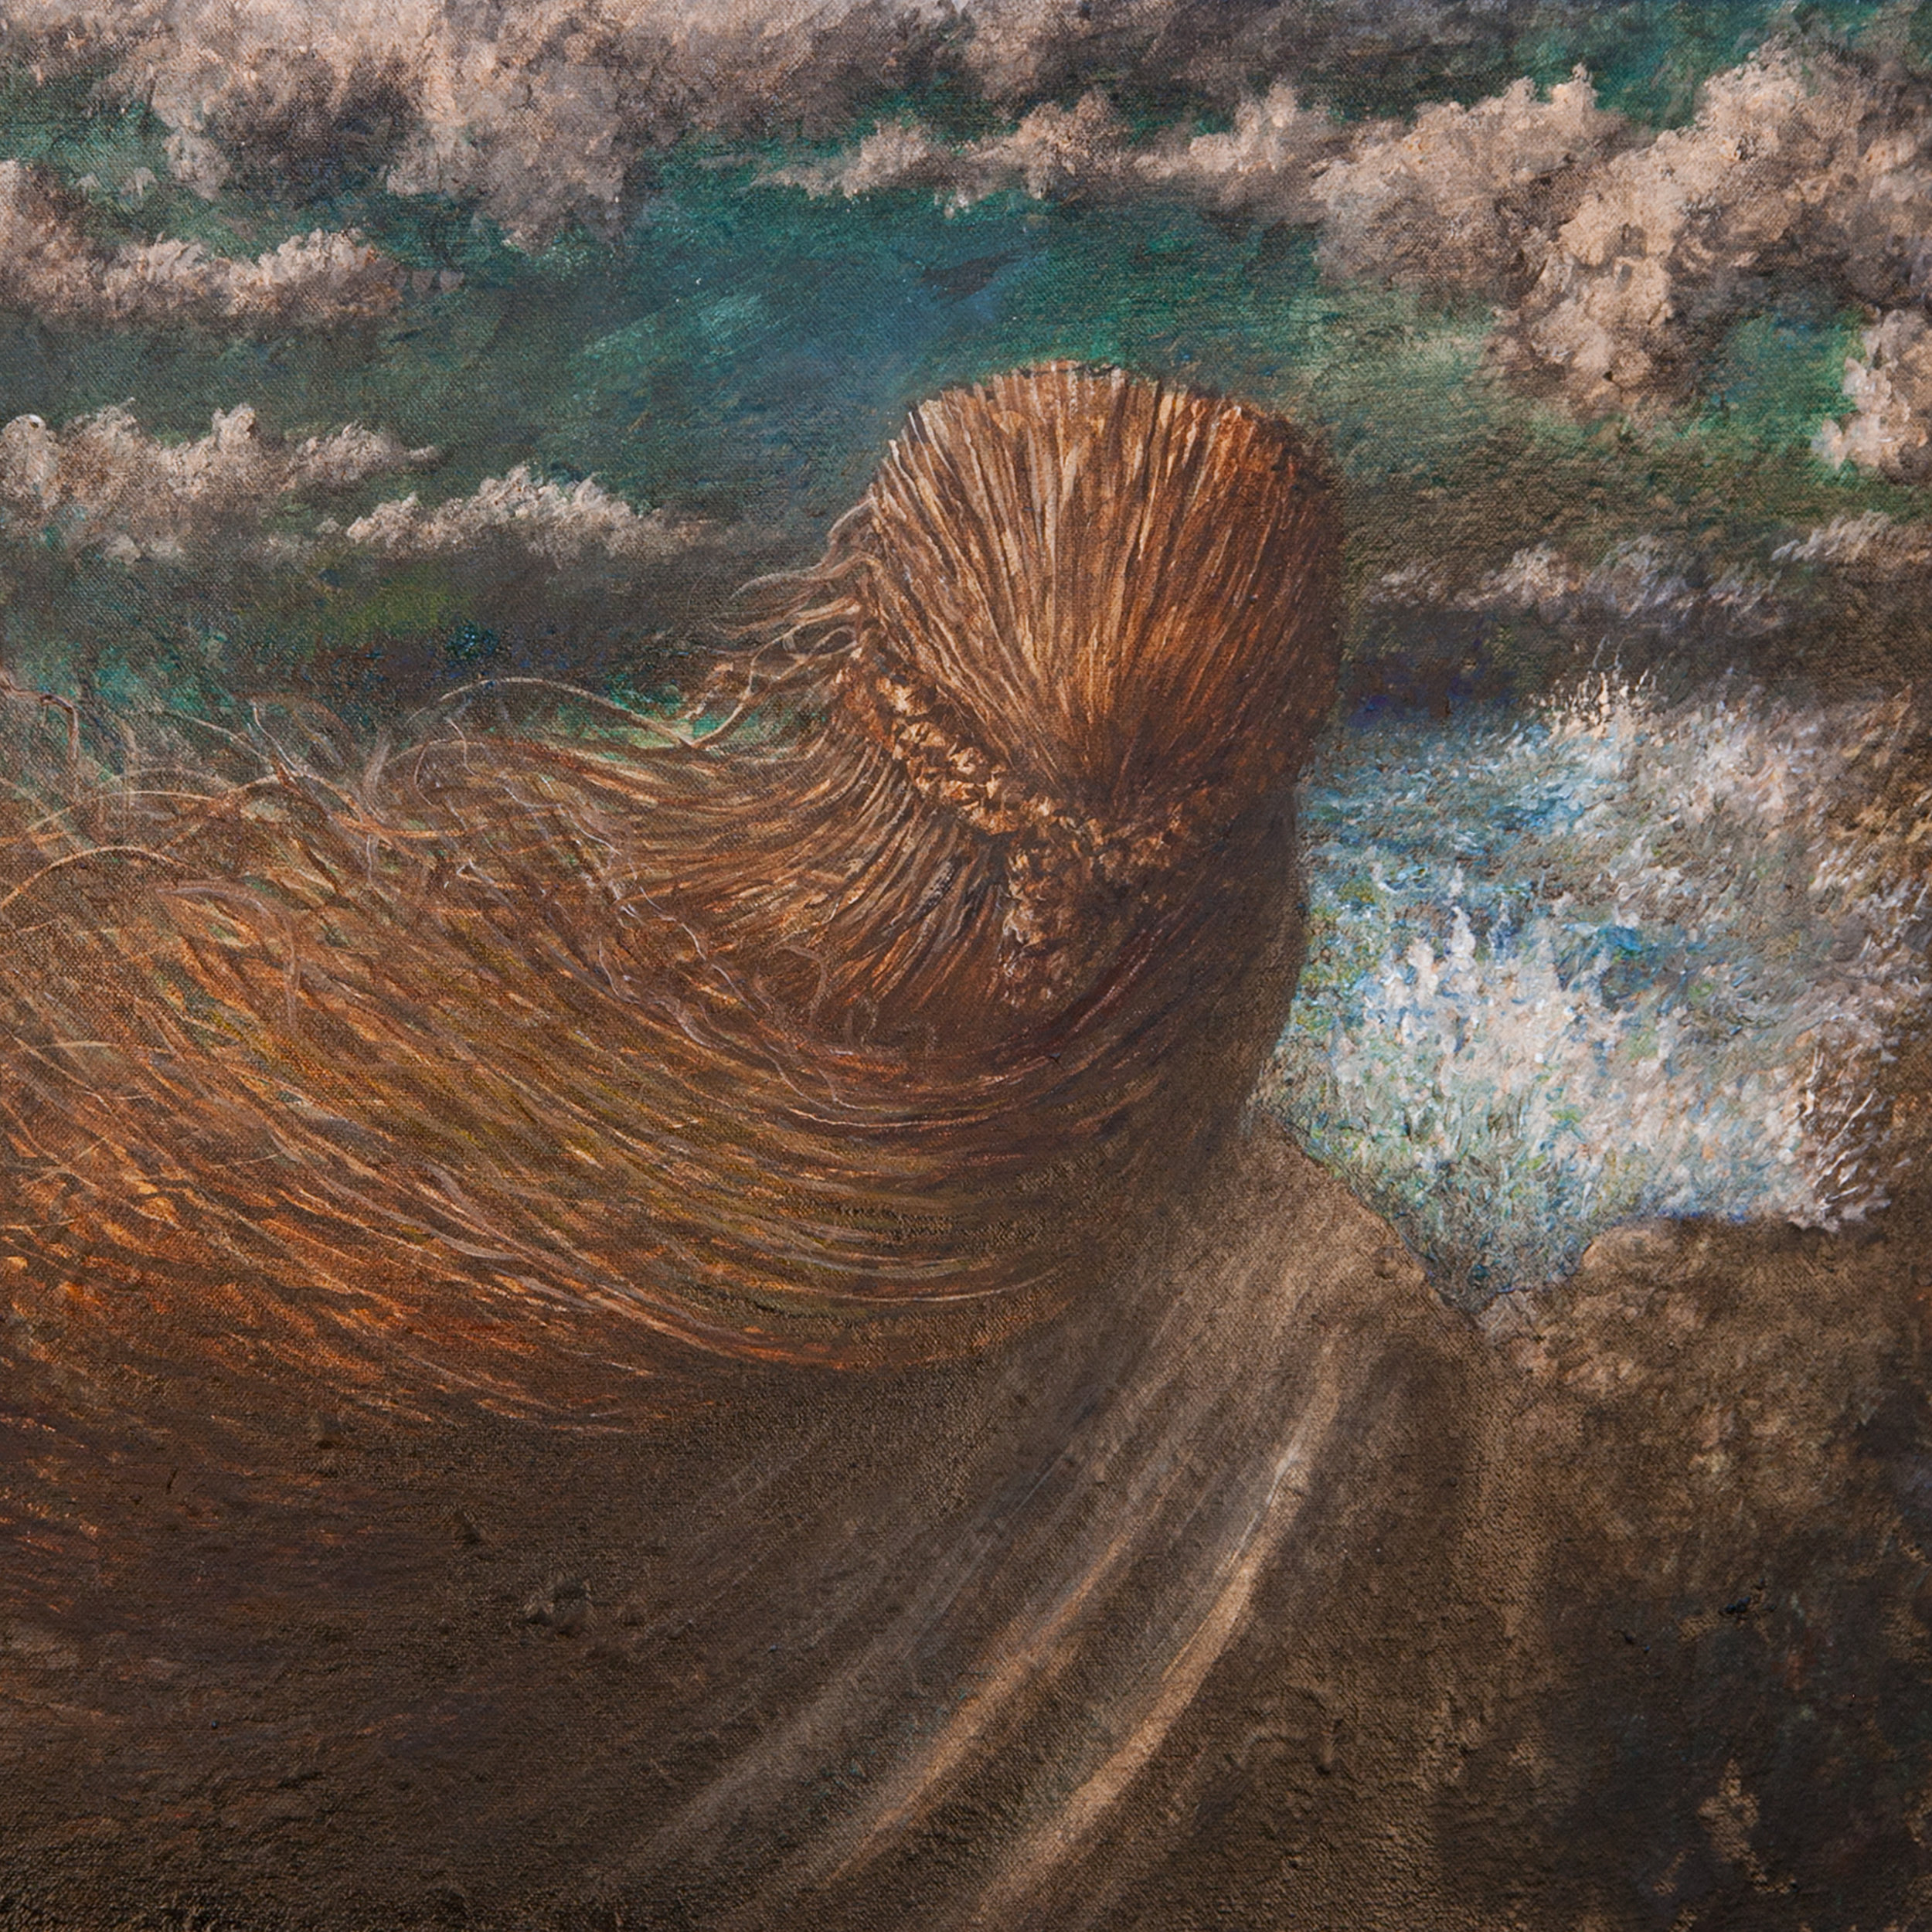 Artowork by Kenneth Lien